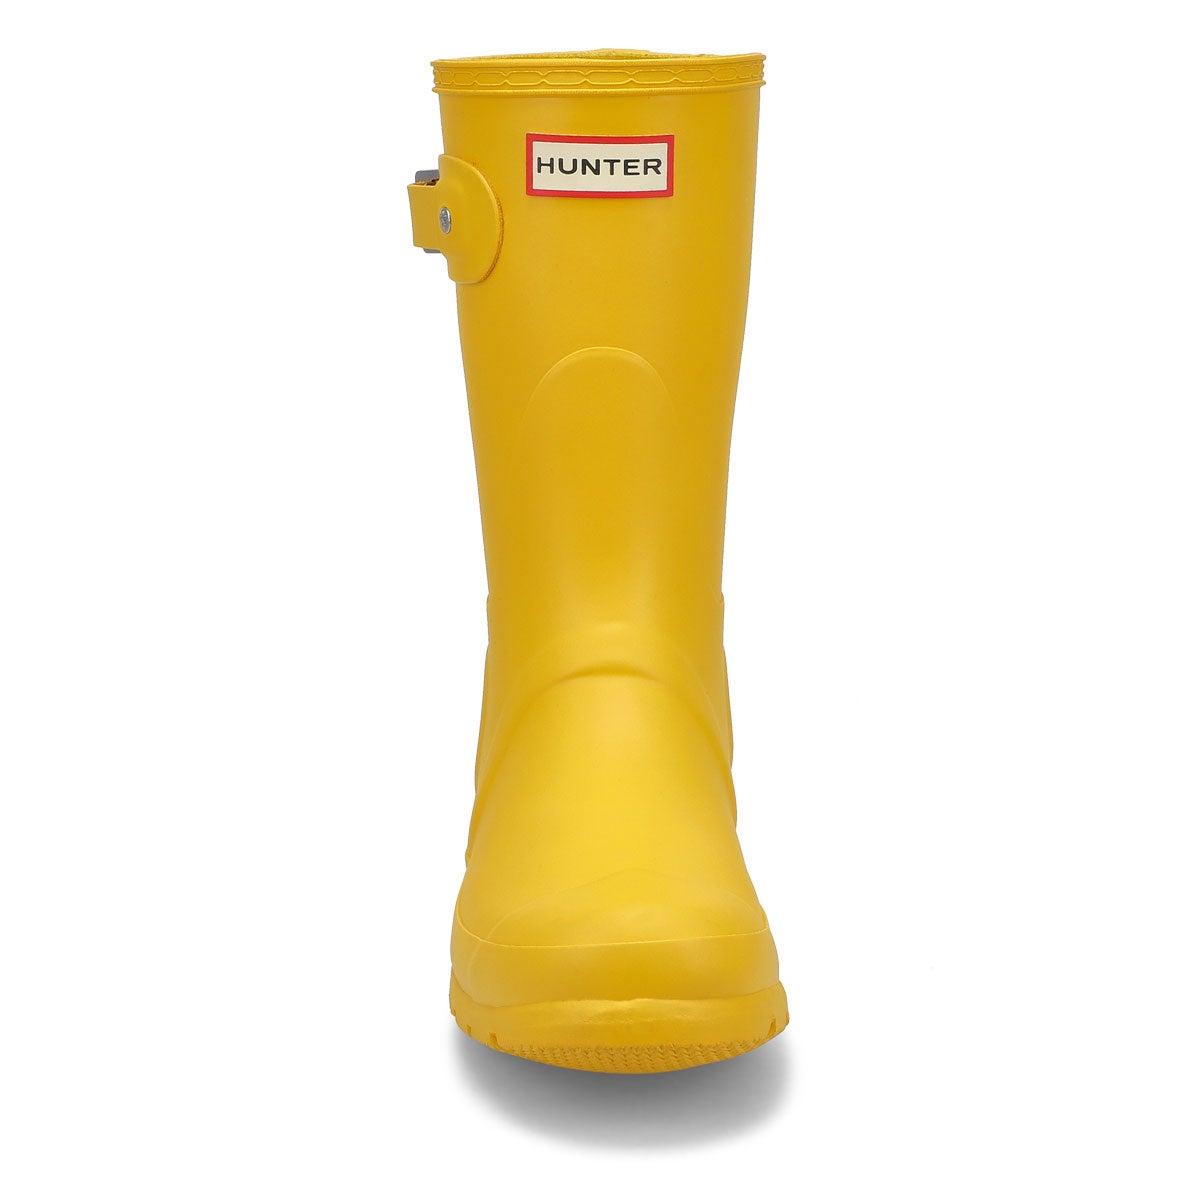 Lds Original Short Classic ylw rain boot